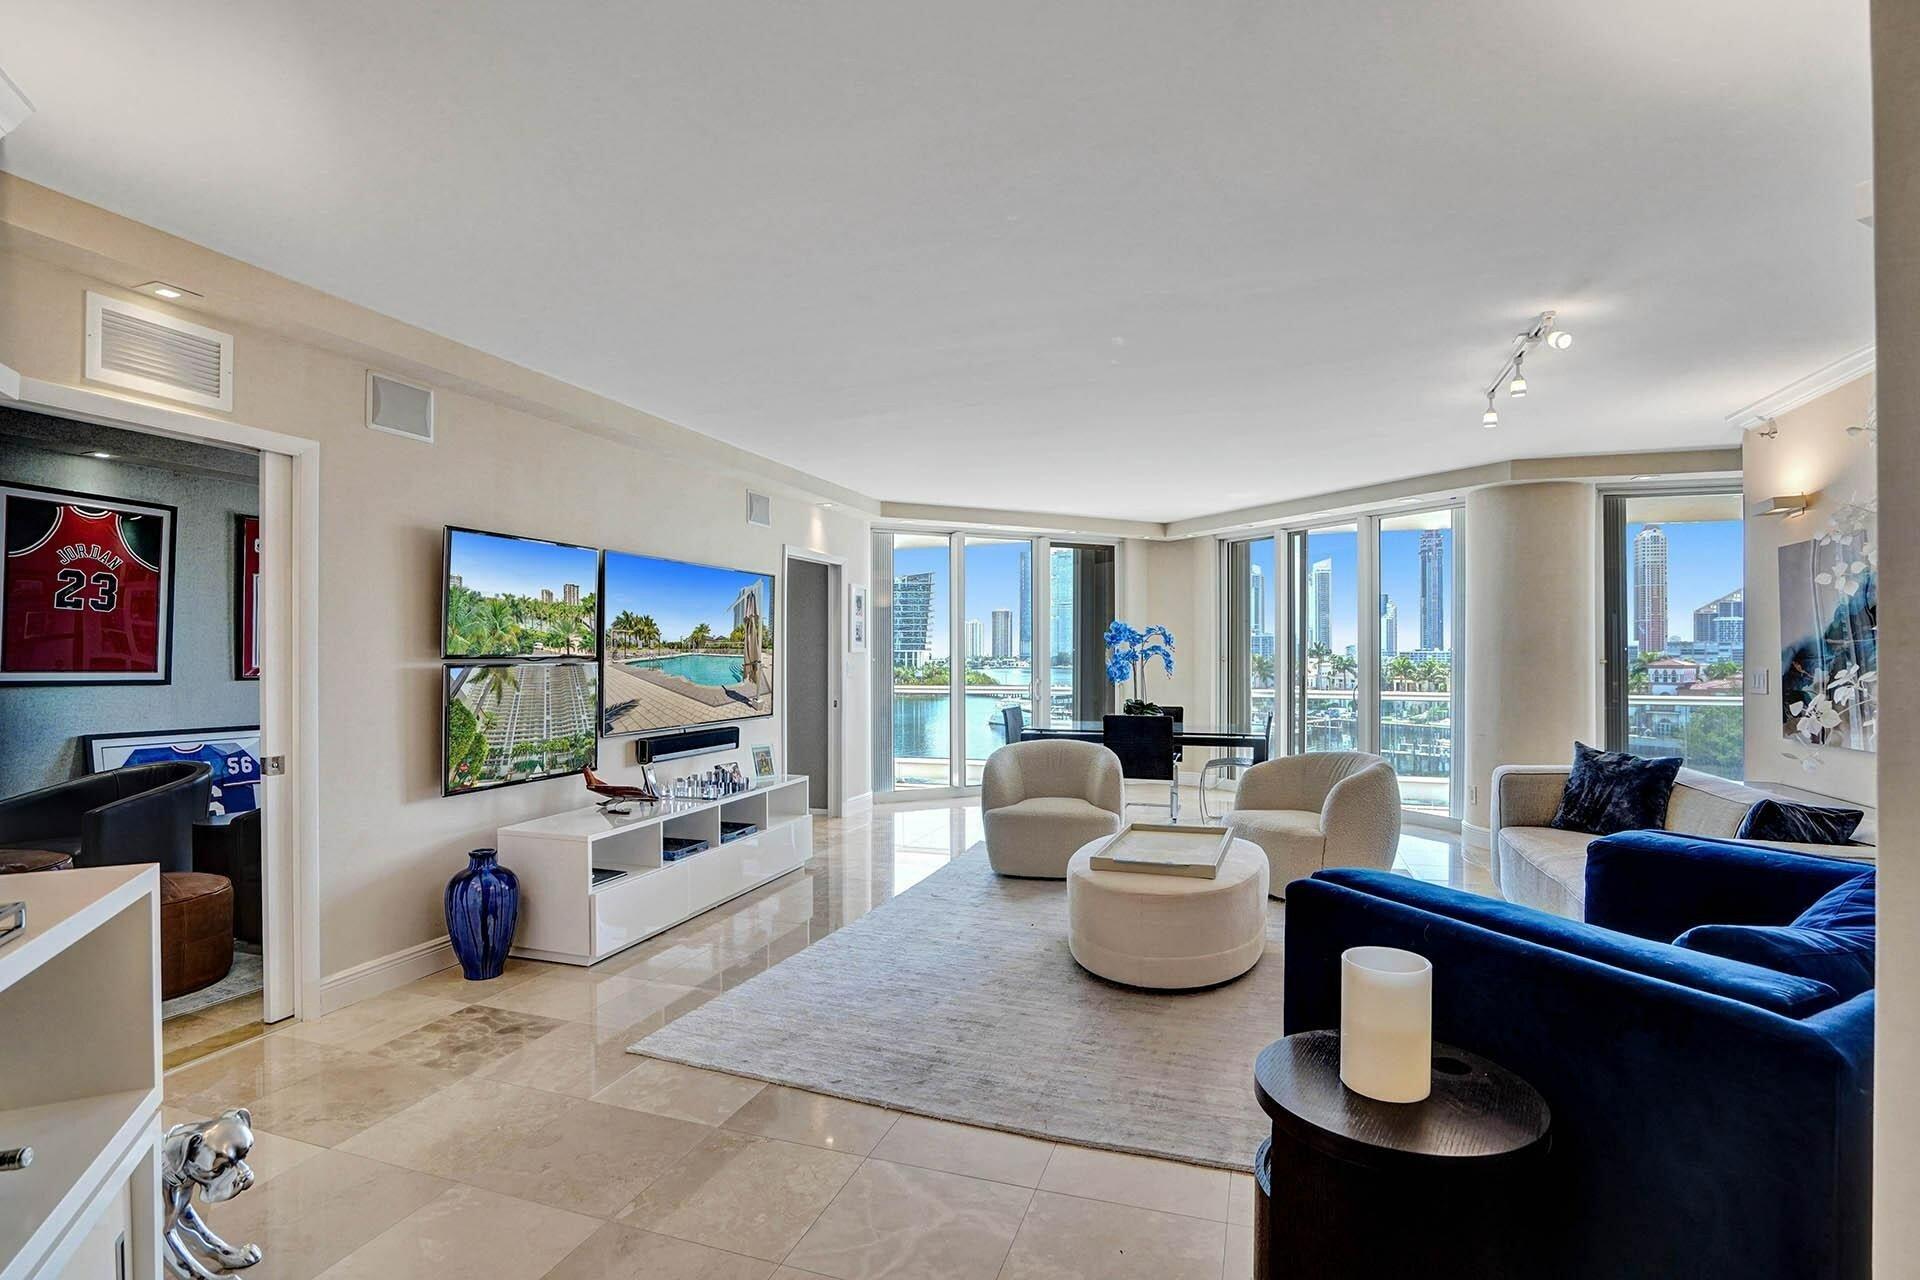 Condo in Golden Beach, Florida, United States 1 - 11529339